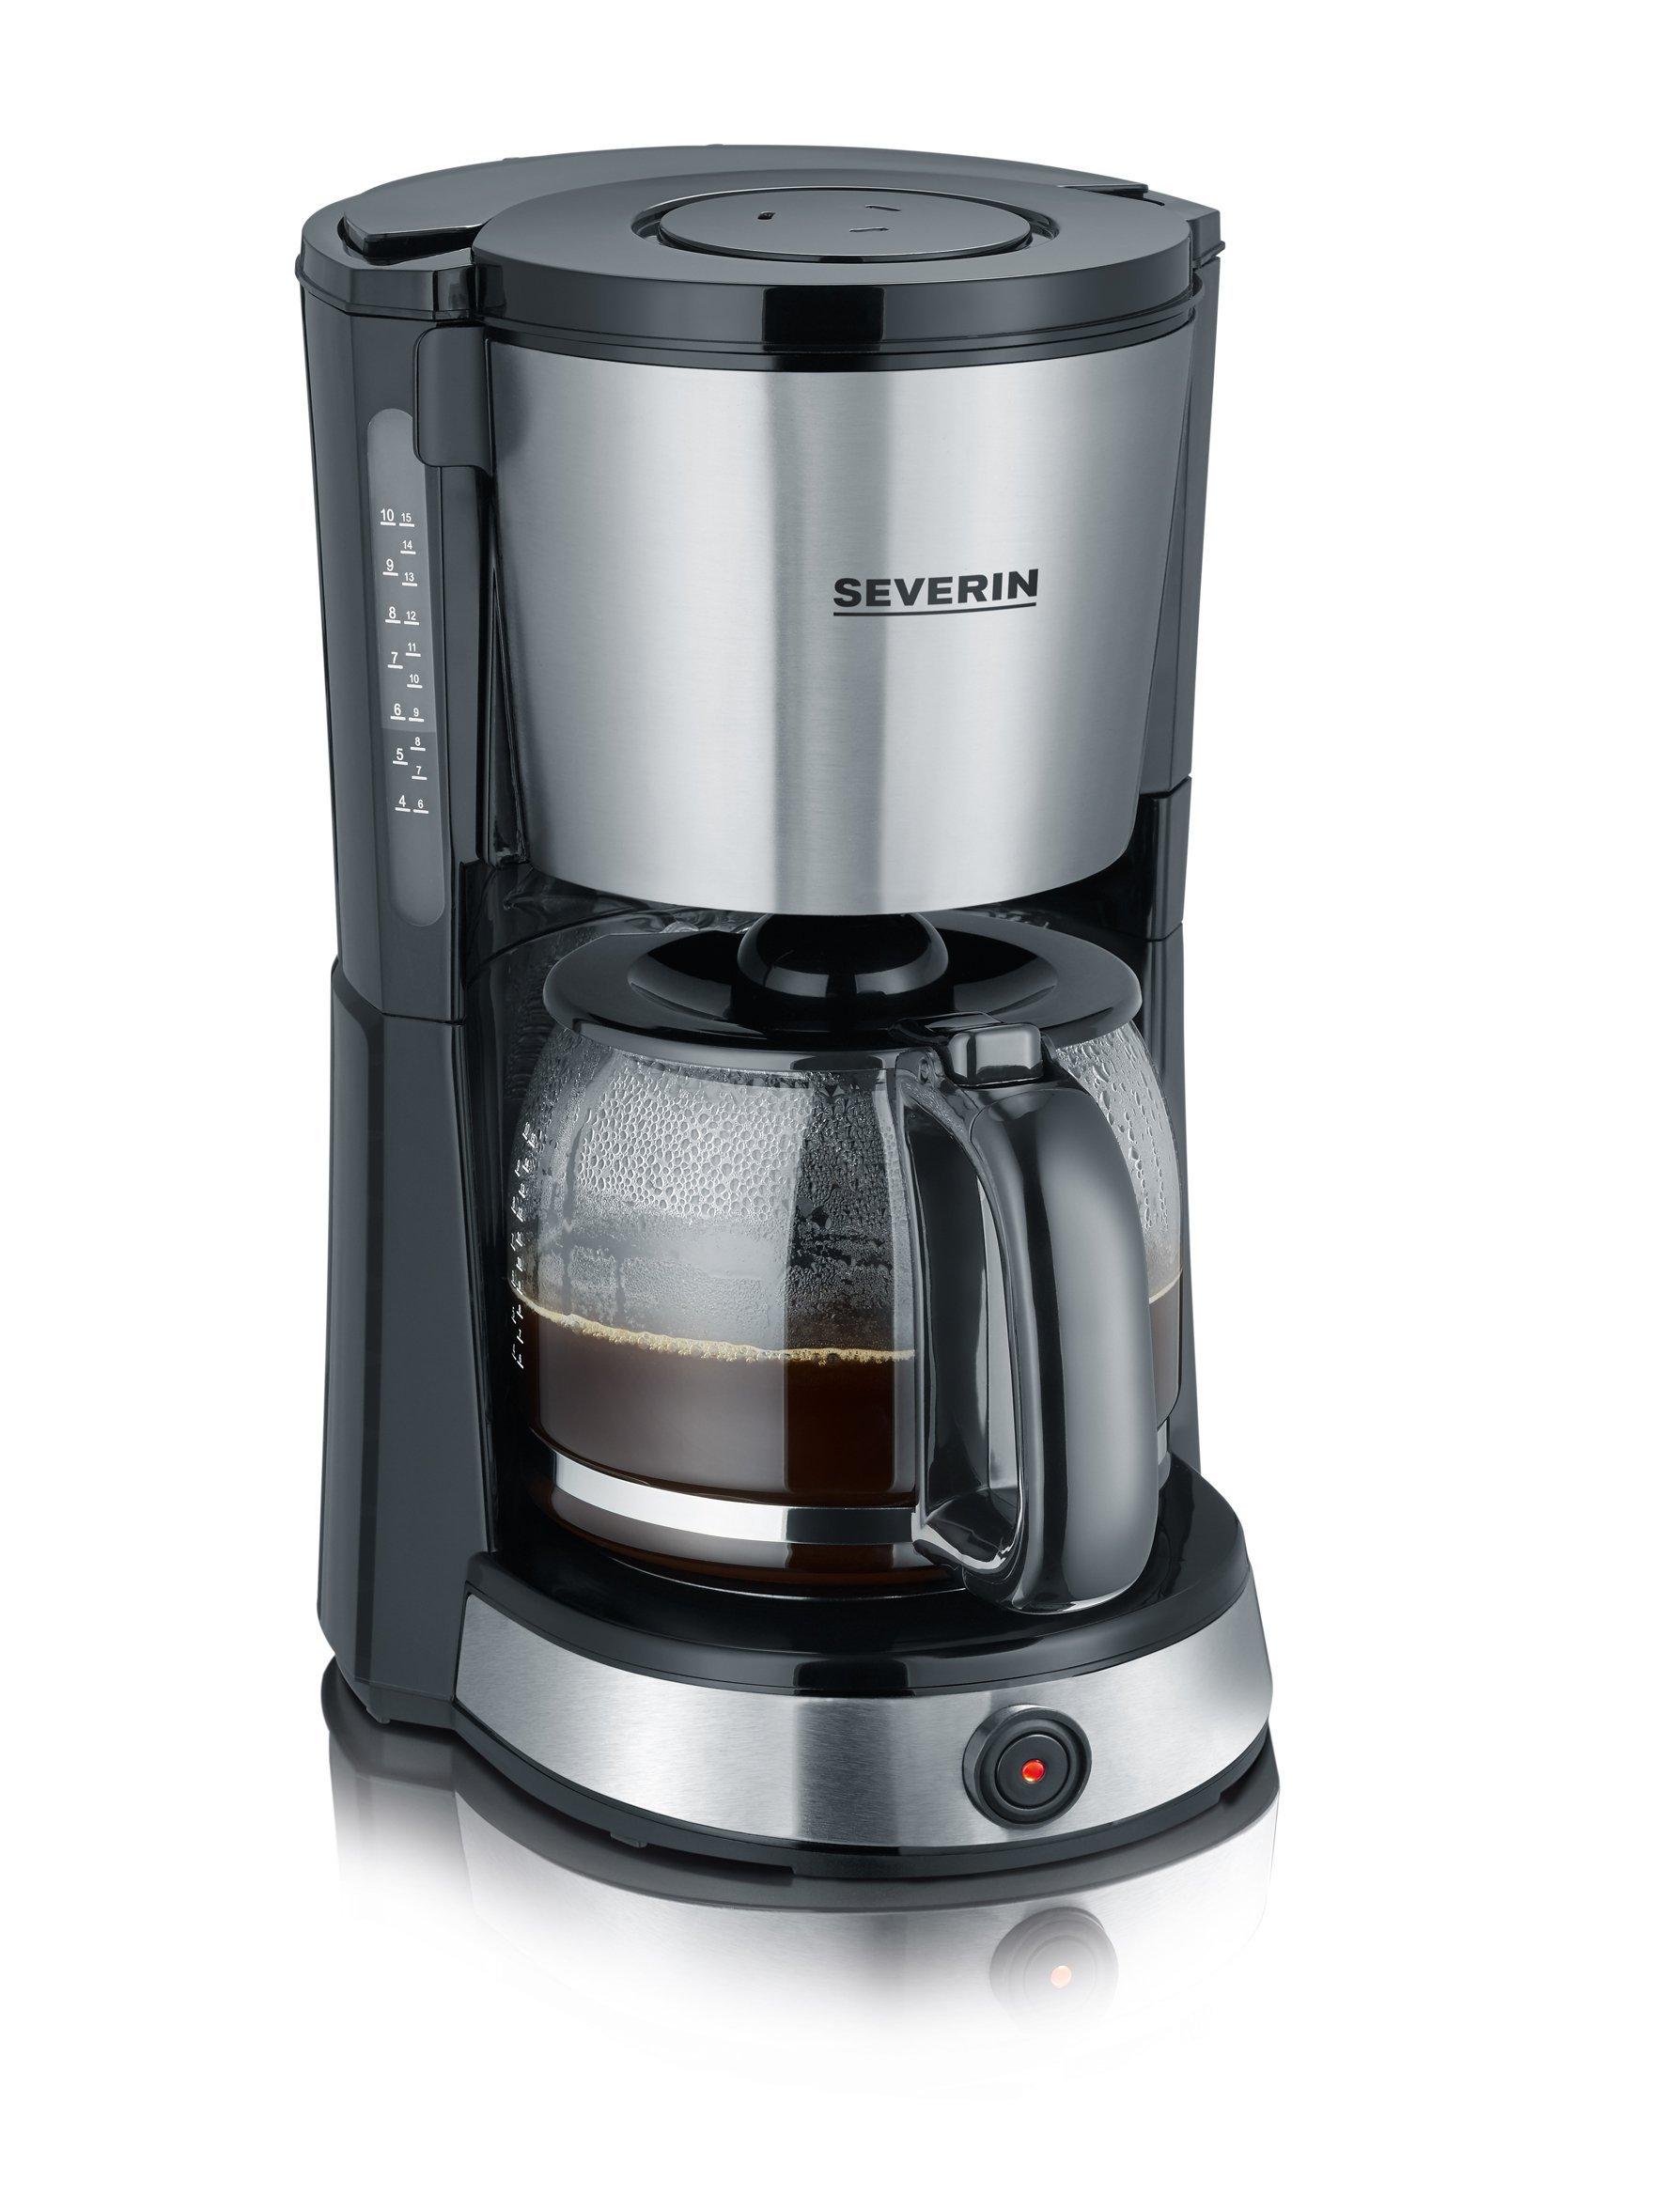 Kaffeeautomat-Select-ca-1000-W-bis-10-Tassen-automatische-Abschaltung-Aromafunktion